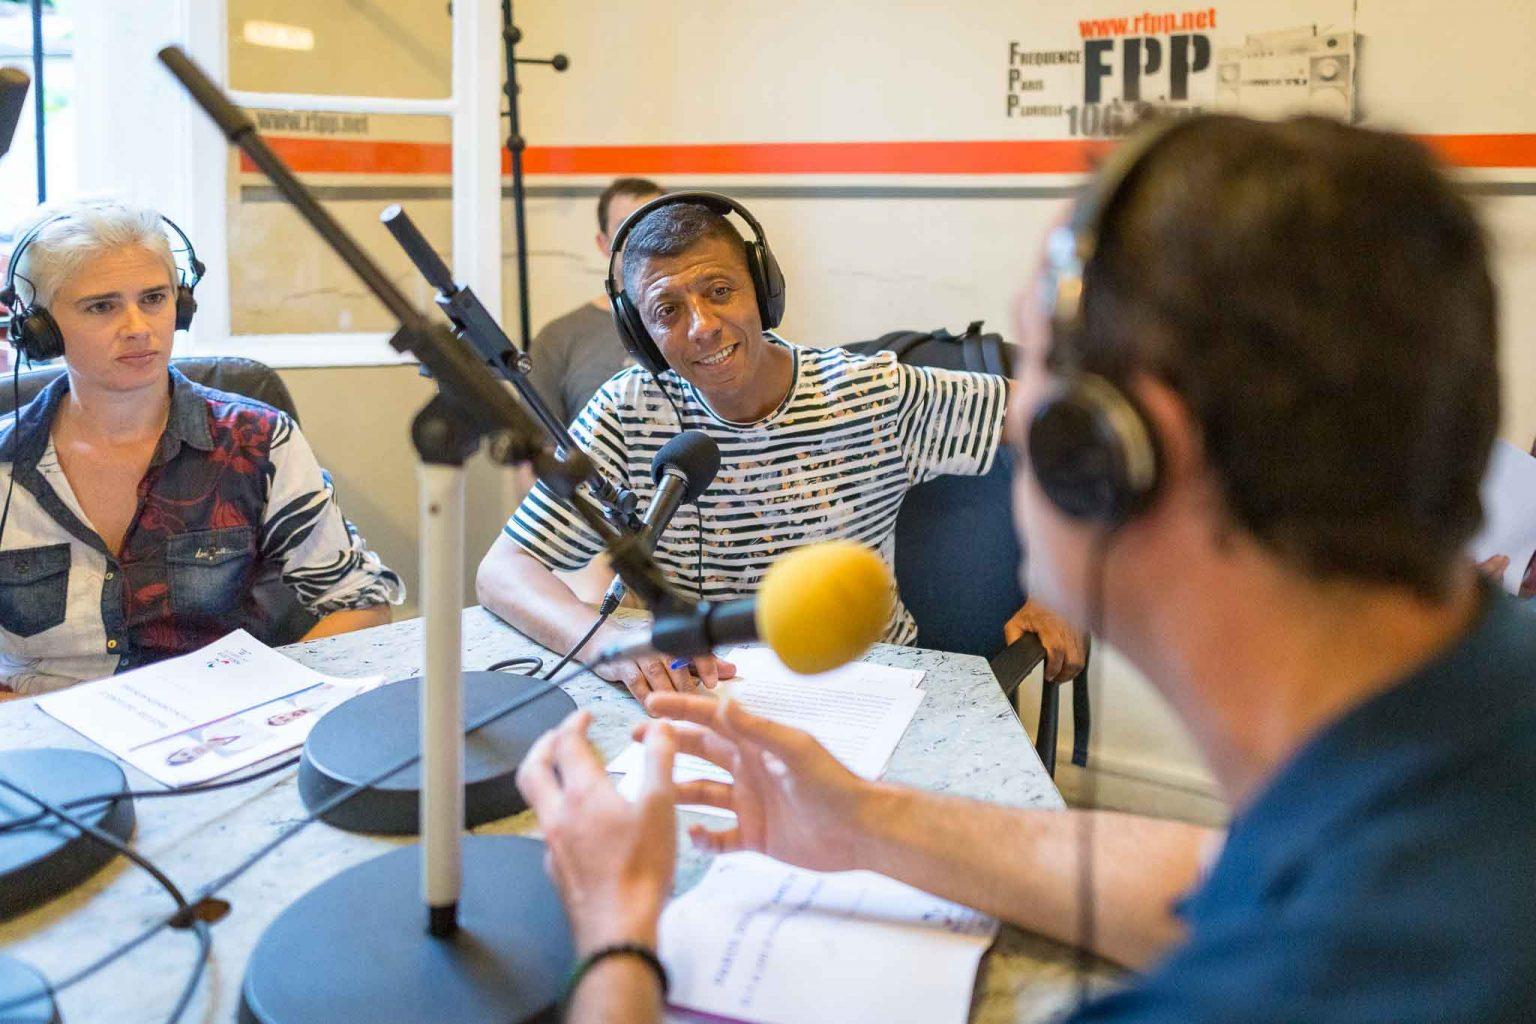 reportage homomicro podcast reportage radio interview paris